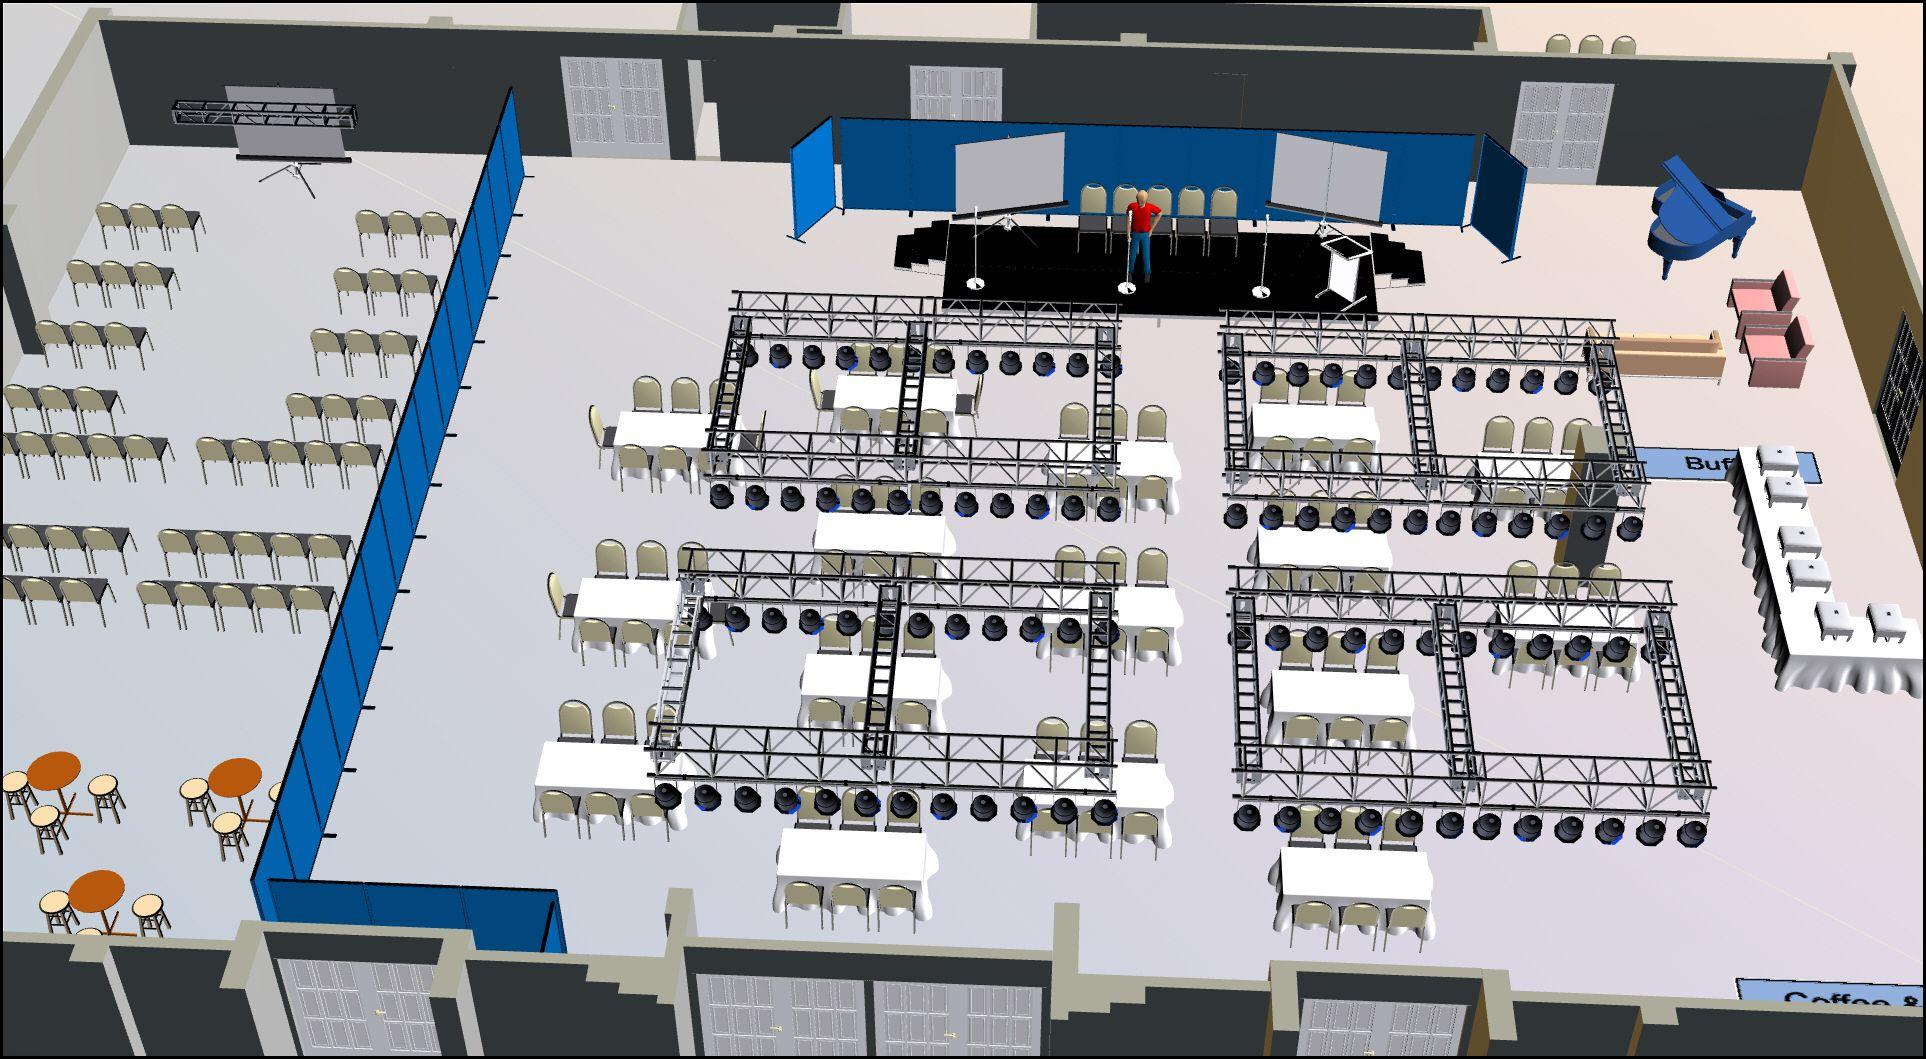 3D Event Floor Plans